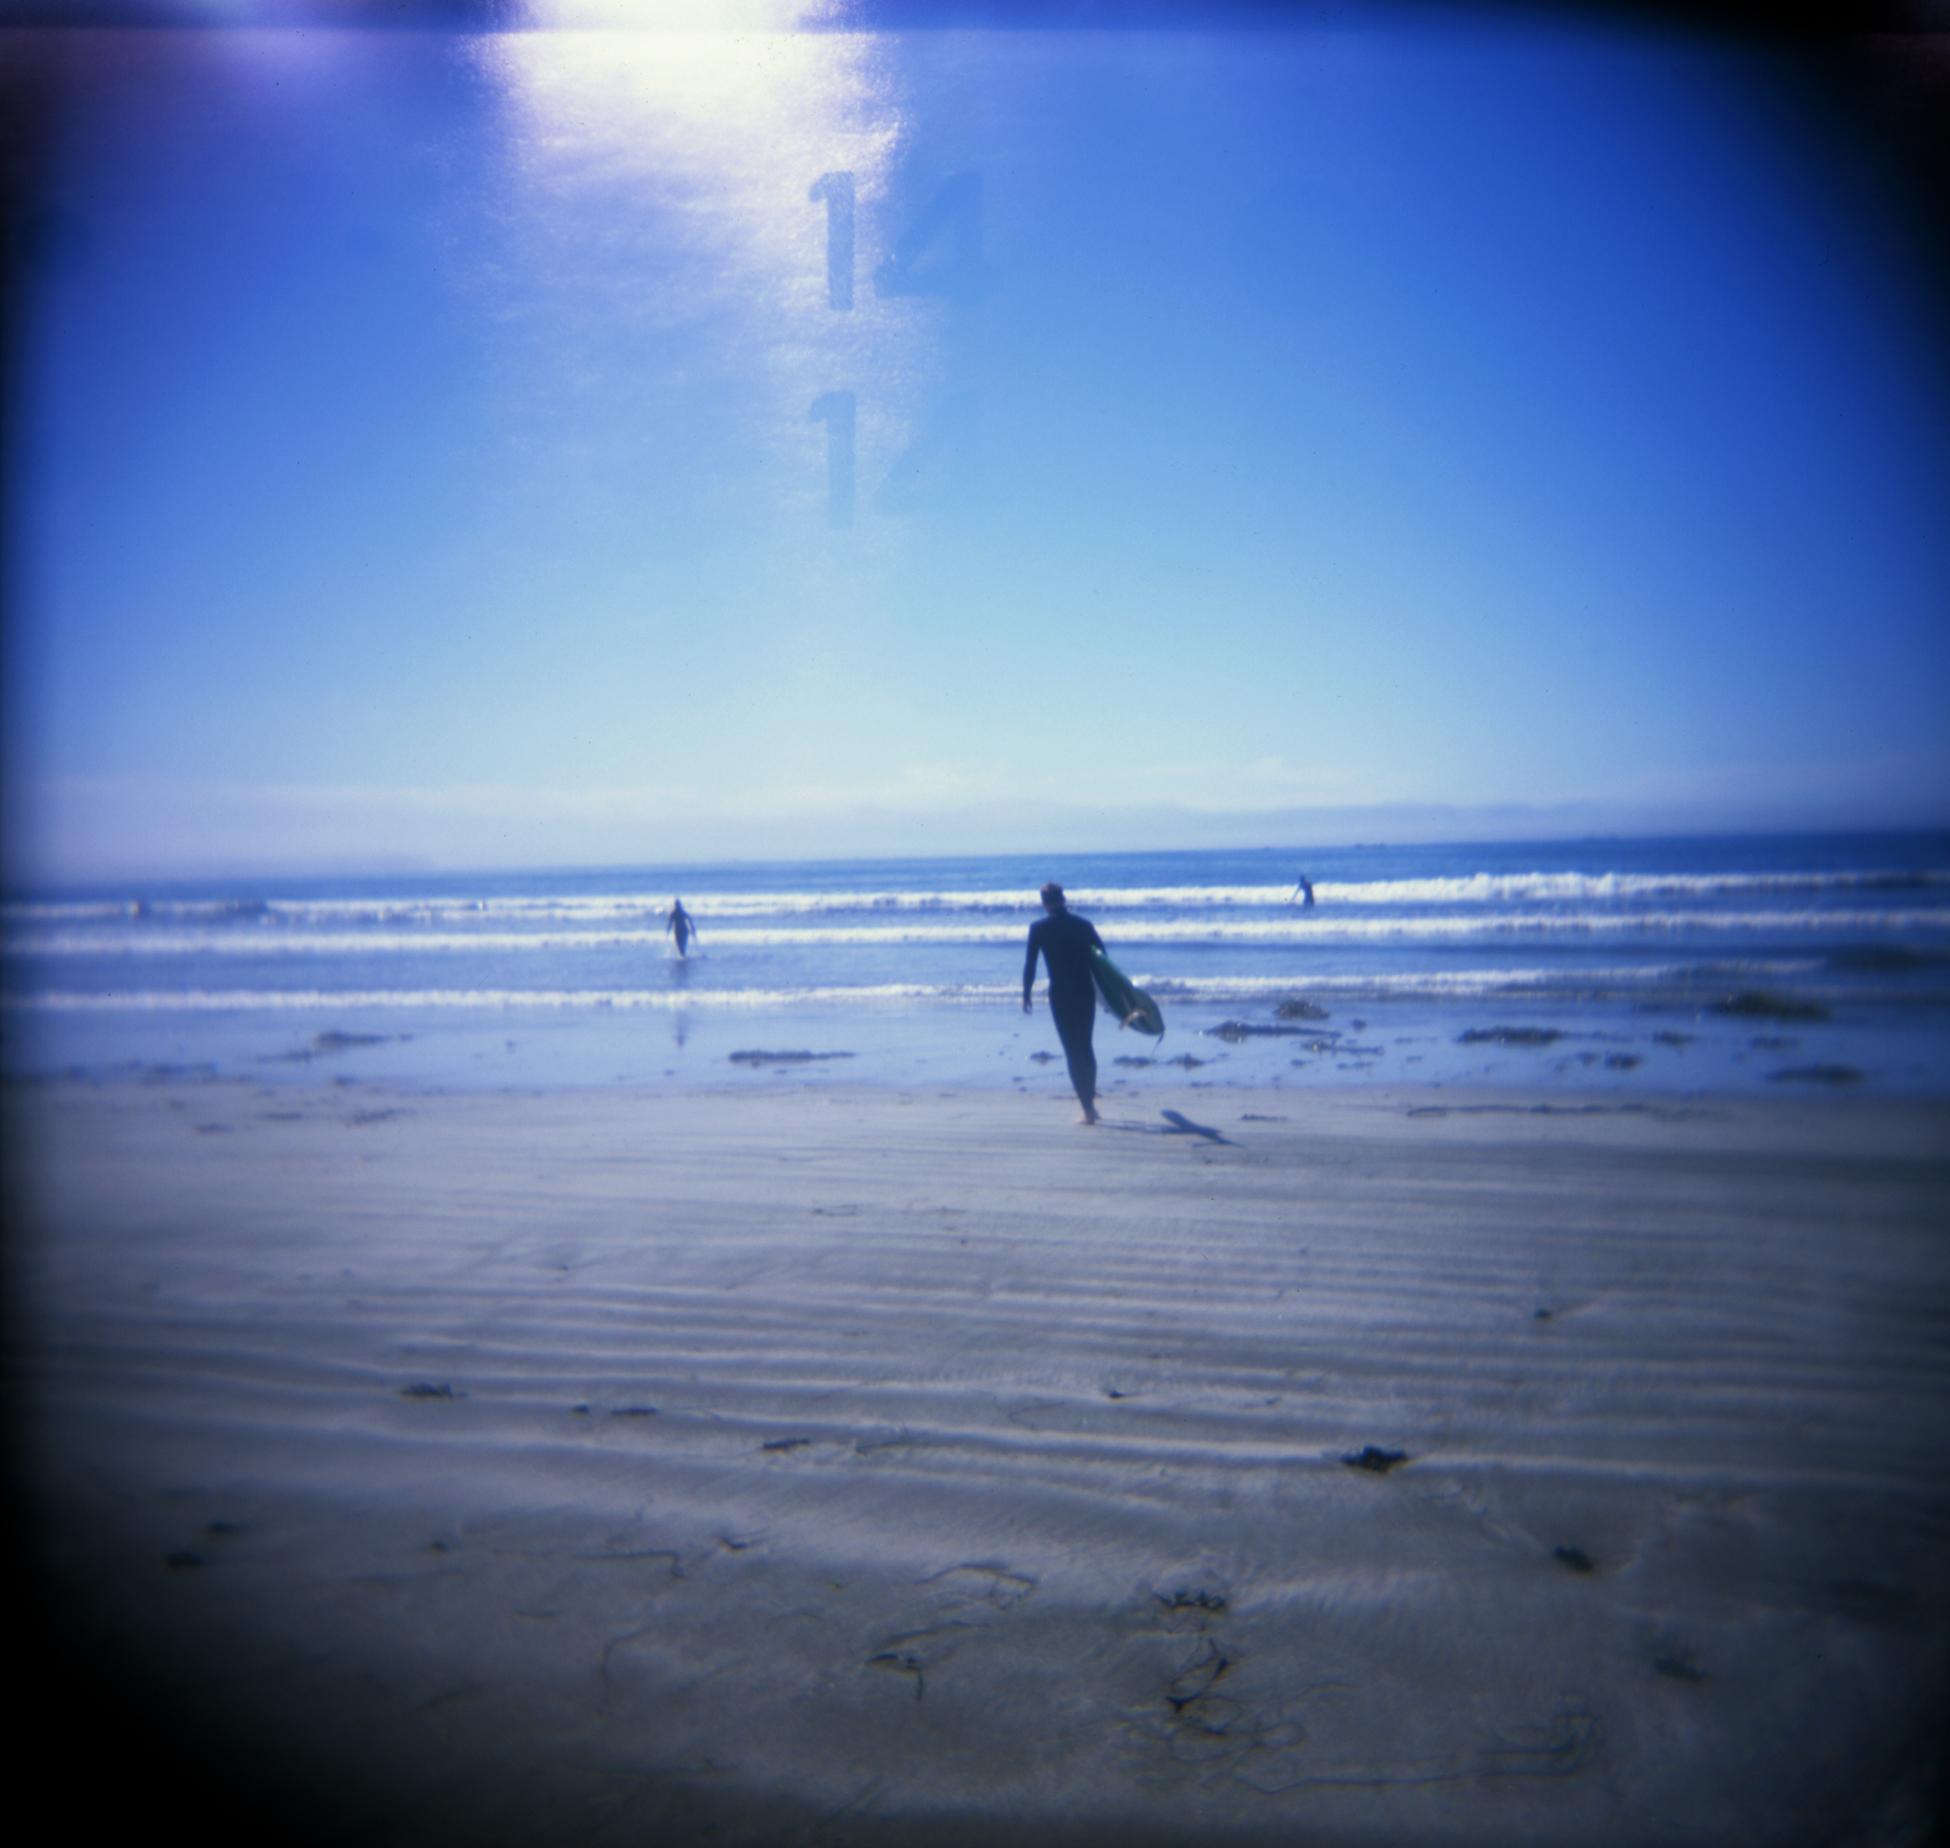 Surfing at Hobuck Beach, WA